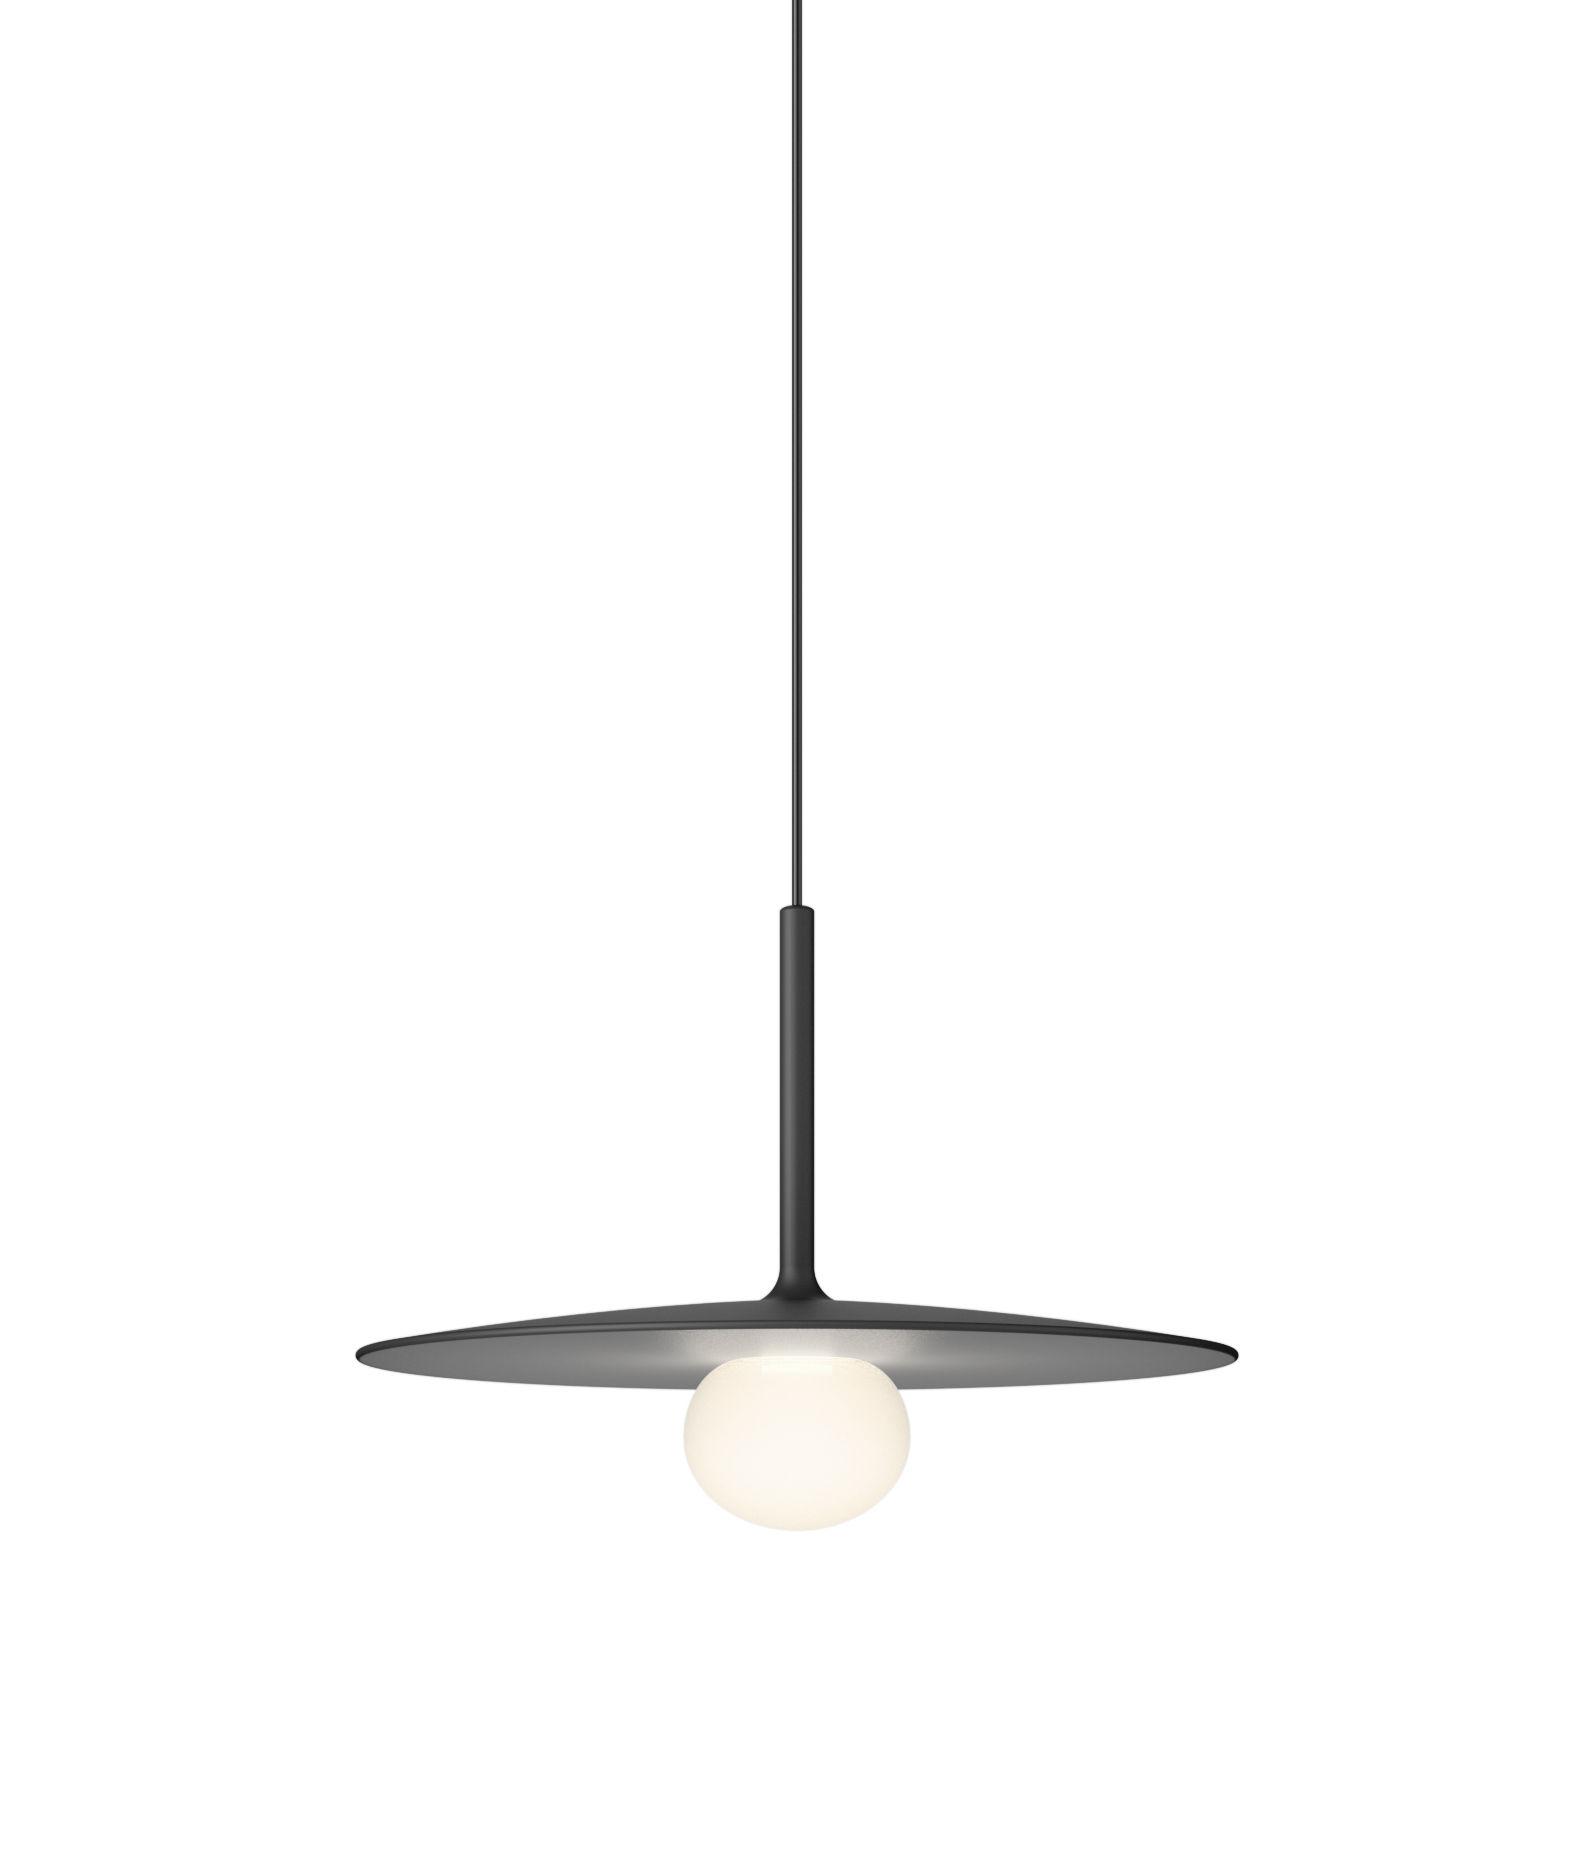 Lighting - Pendant Lighting - Tempo Disque Small Pendant - / LED - Ø 25 cm by Vibia - Graphite grey - Blown glass, Lacquered aluminium